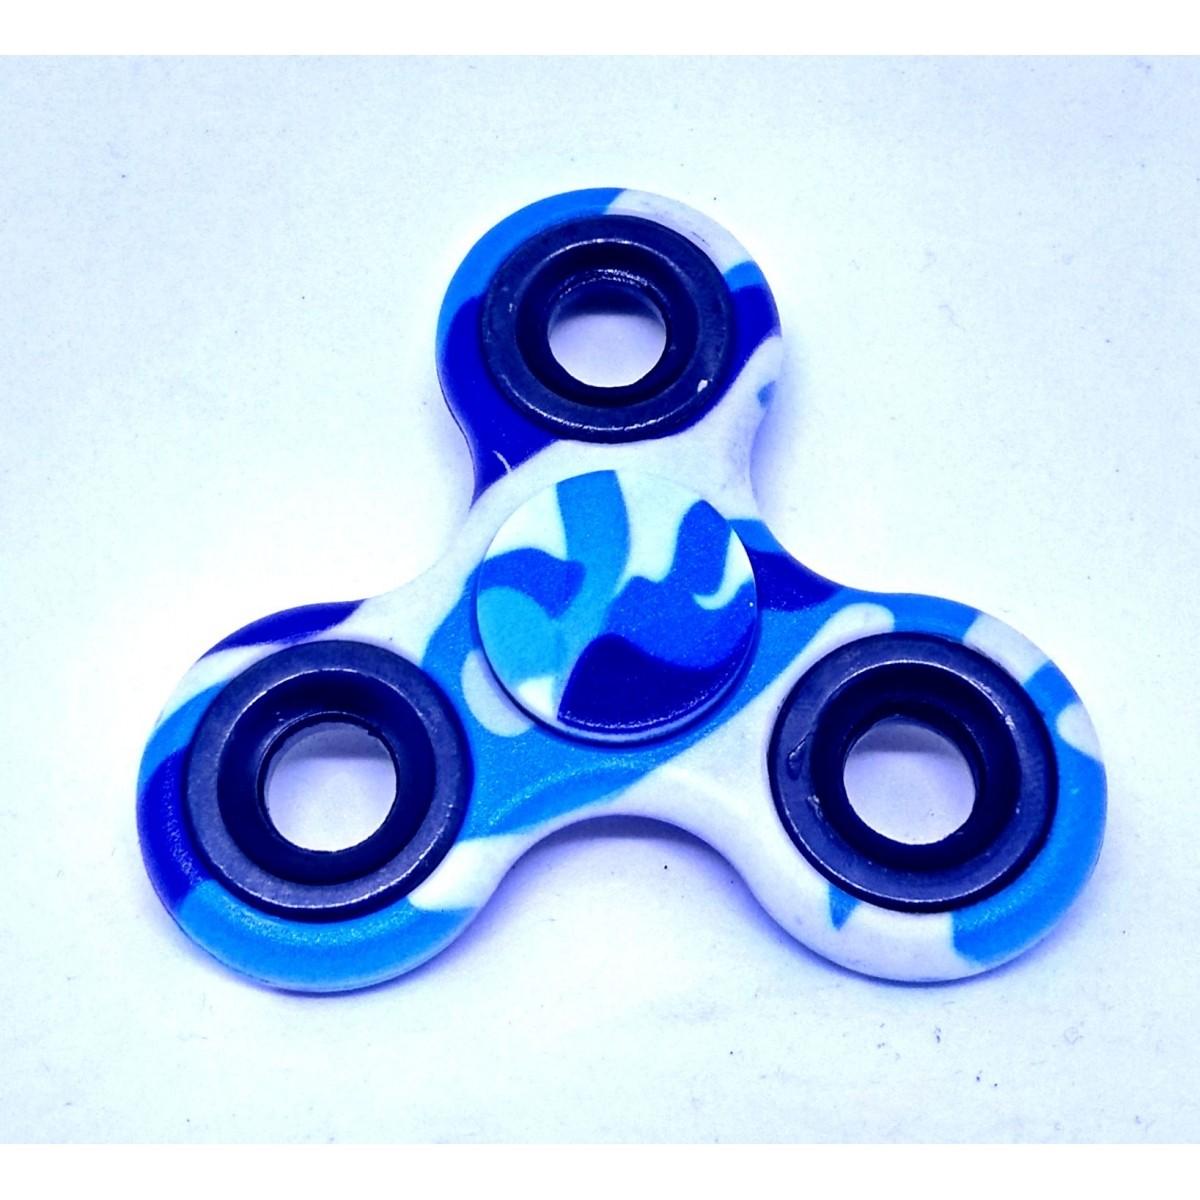 Hand Spinner Camuflado - Rolamento Anti Estresse Fidget Hand Spinner